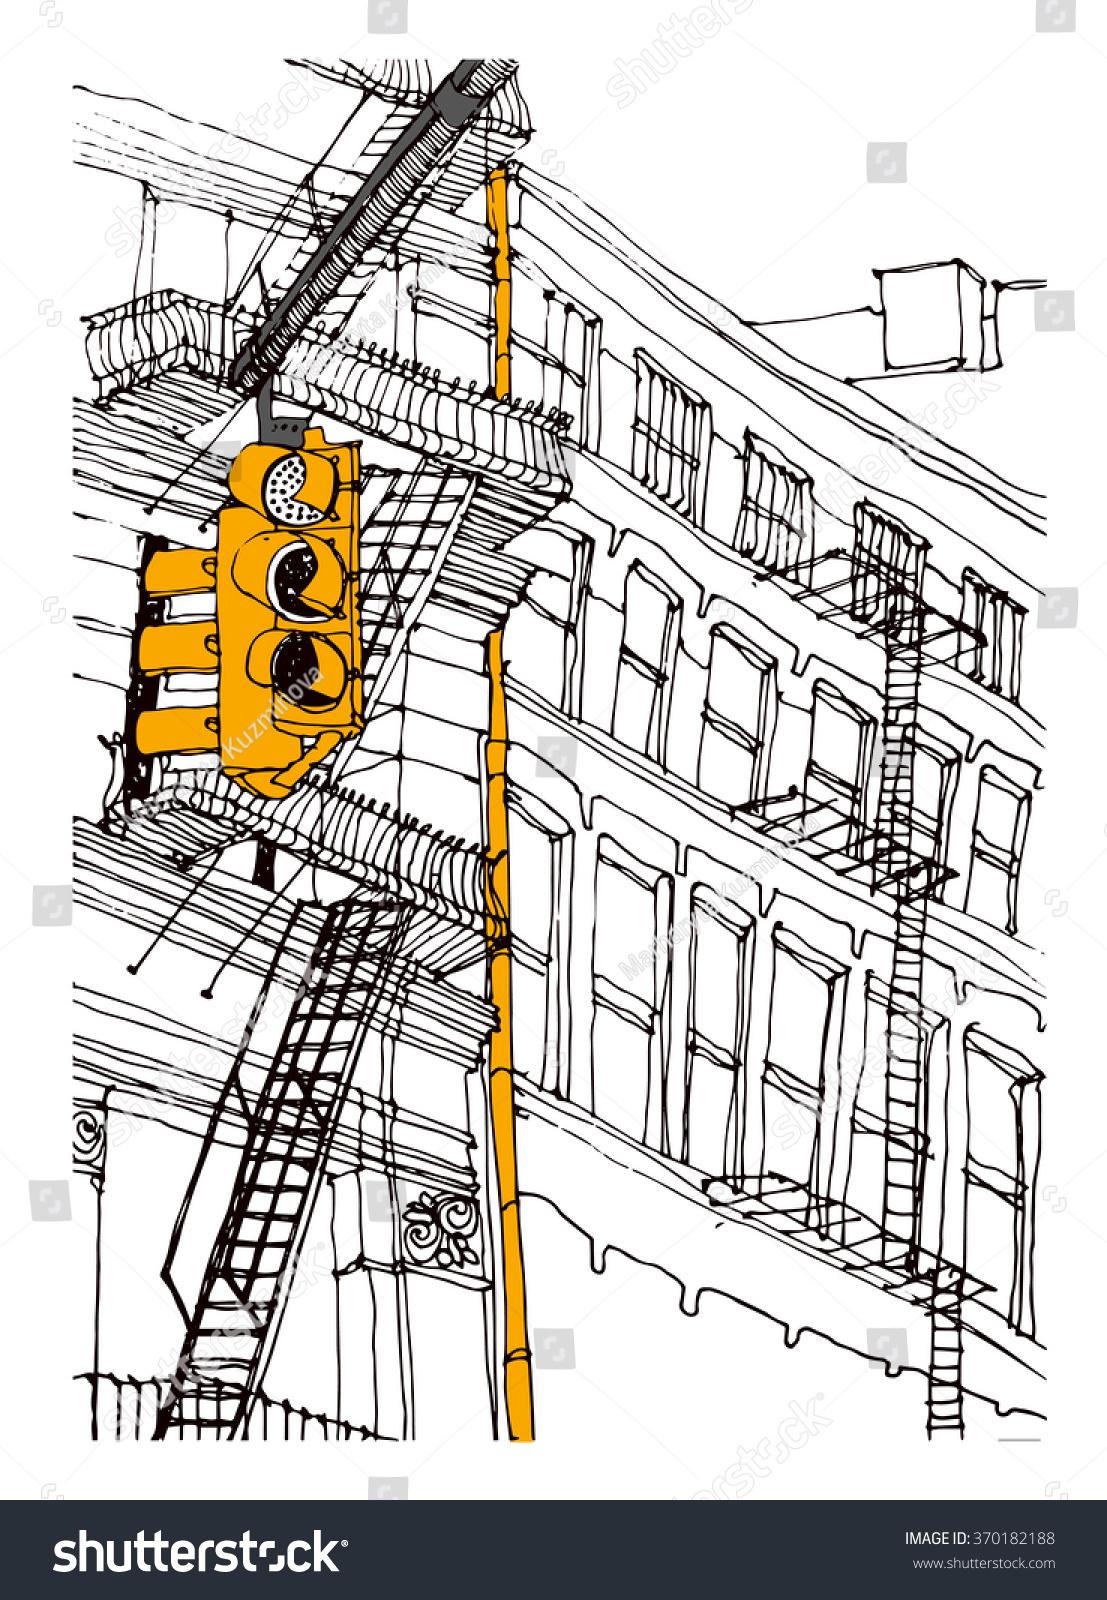 Scene Street Illustration Hand Drawn Ink Stock Vector Royalty Free Traffic Light Schematic Diagram Line Sketch New York Citymanhattan With Buildings